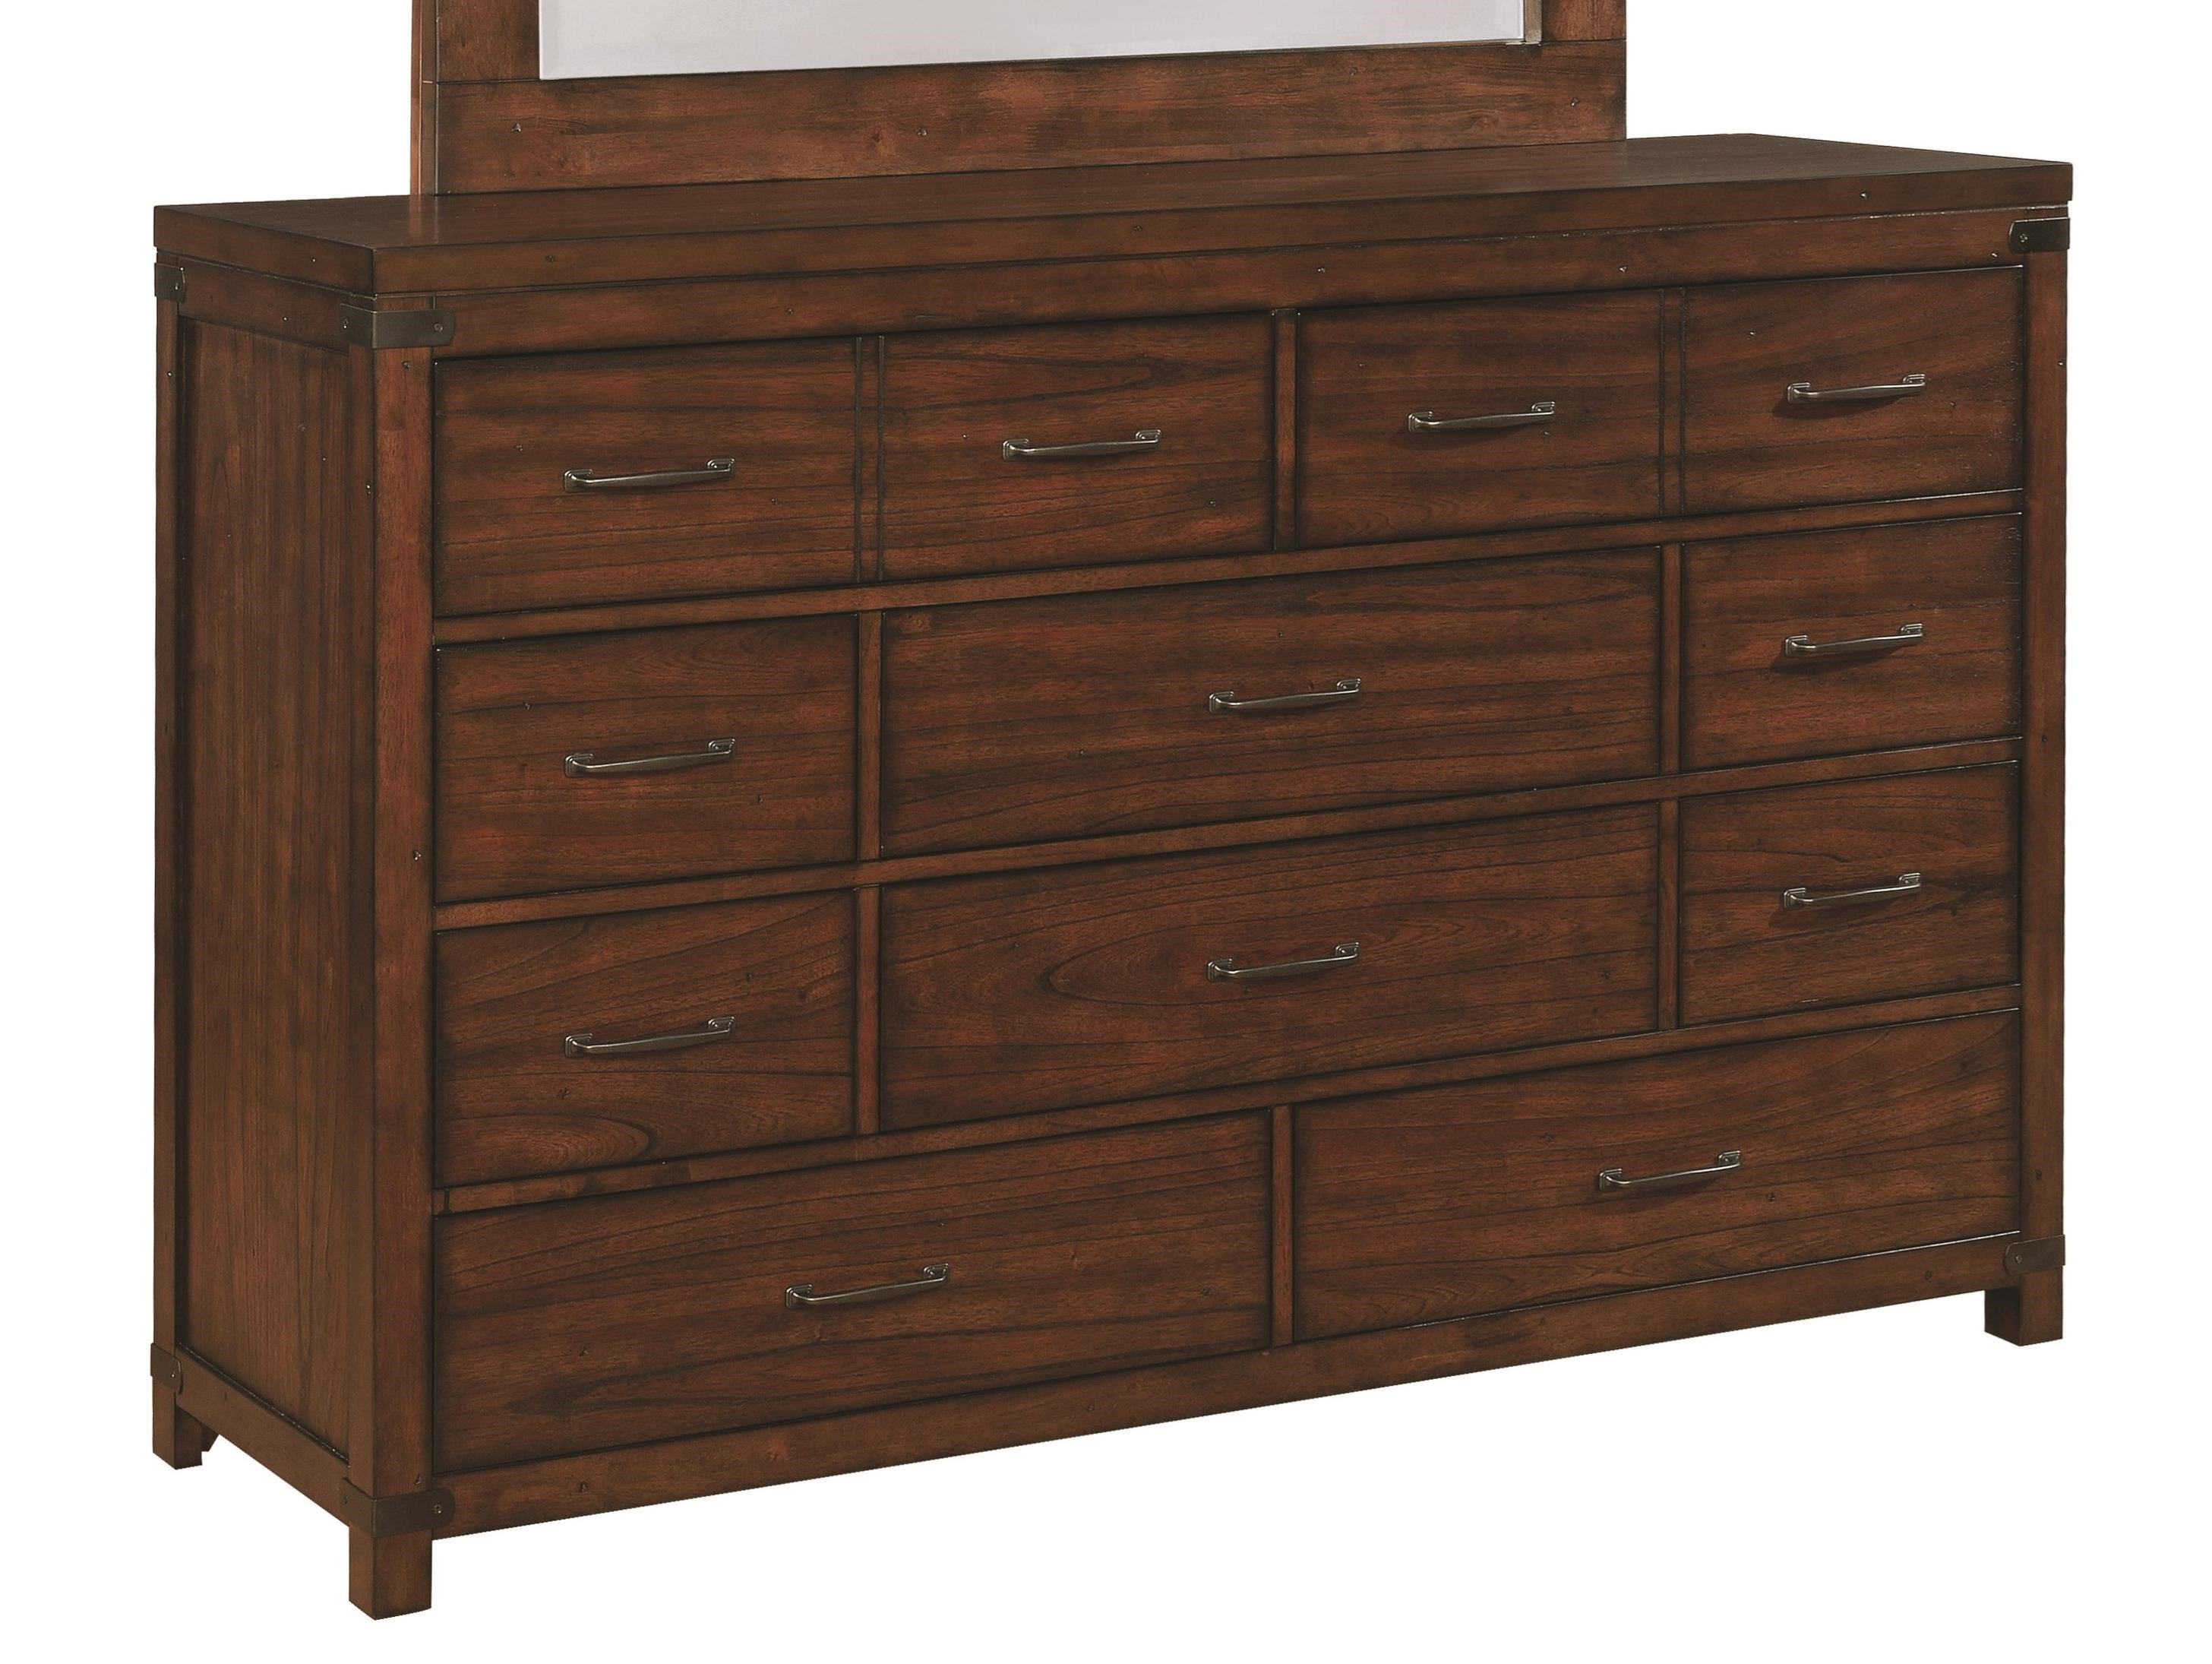 Scott Living Artesia 10 Drawer Dresser - Item Number: 204477